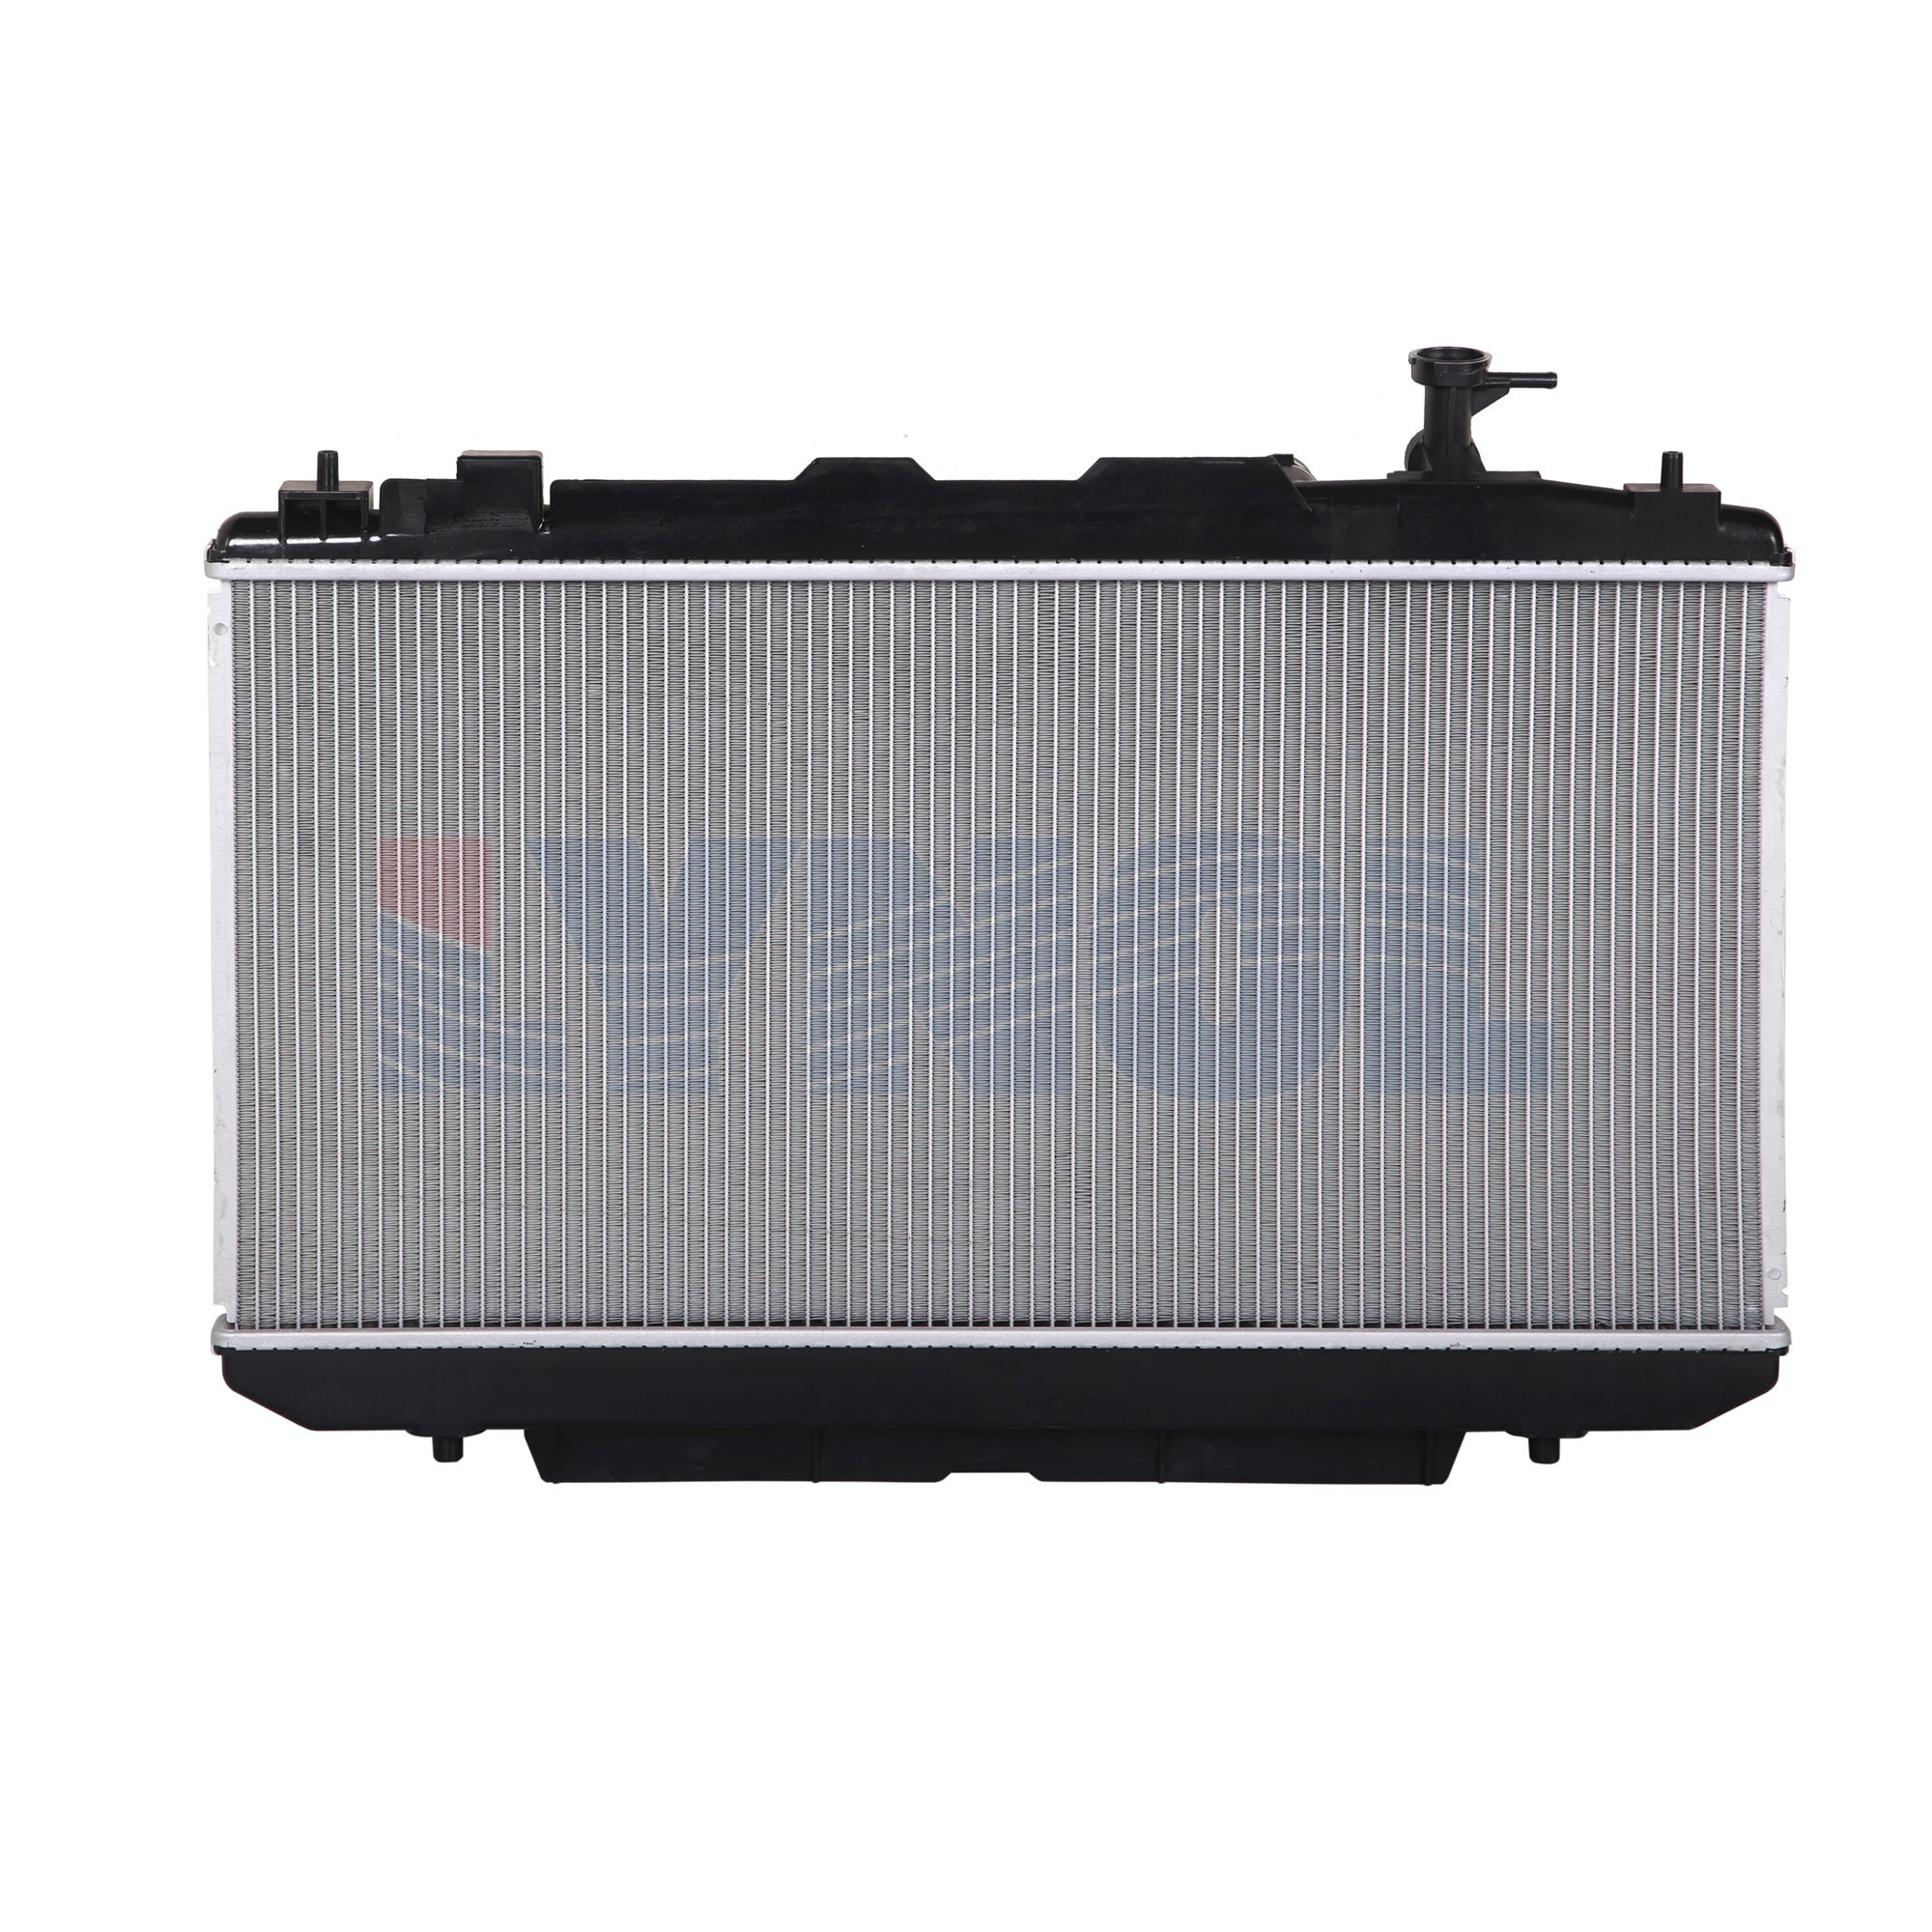 Lynol Truck Parts > Automotive Radiator > LR2411